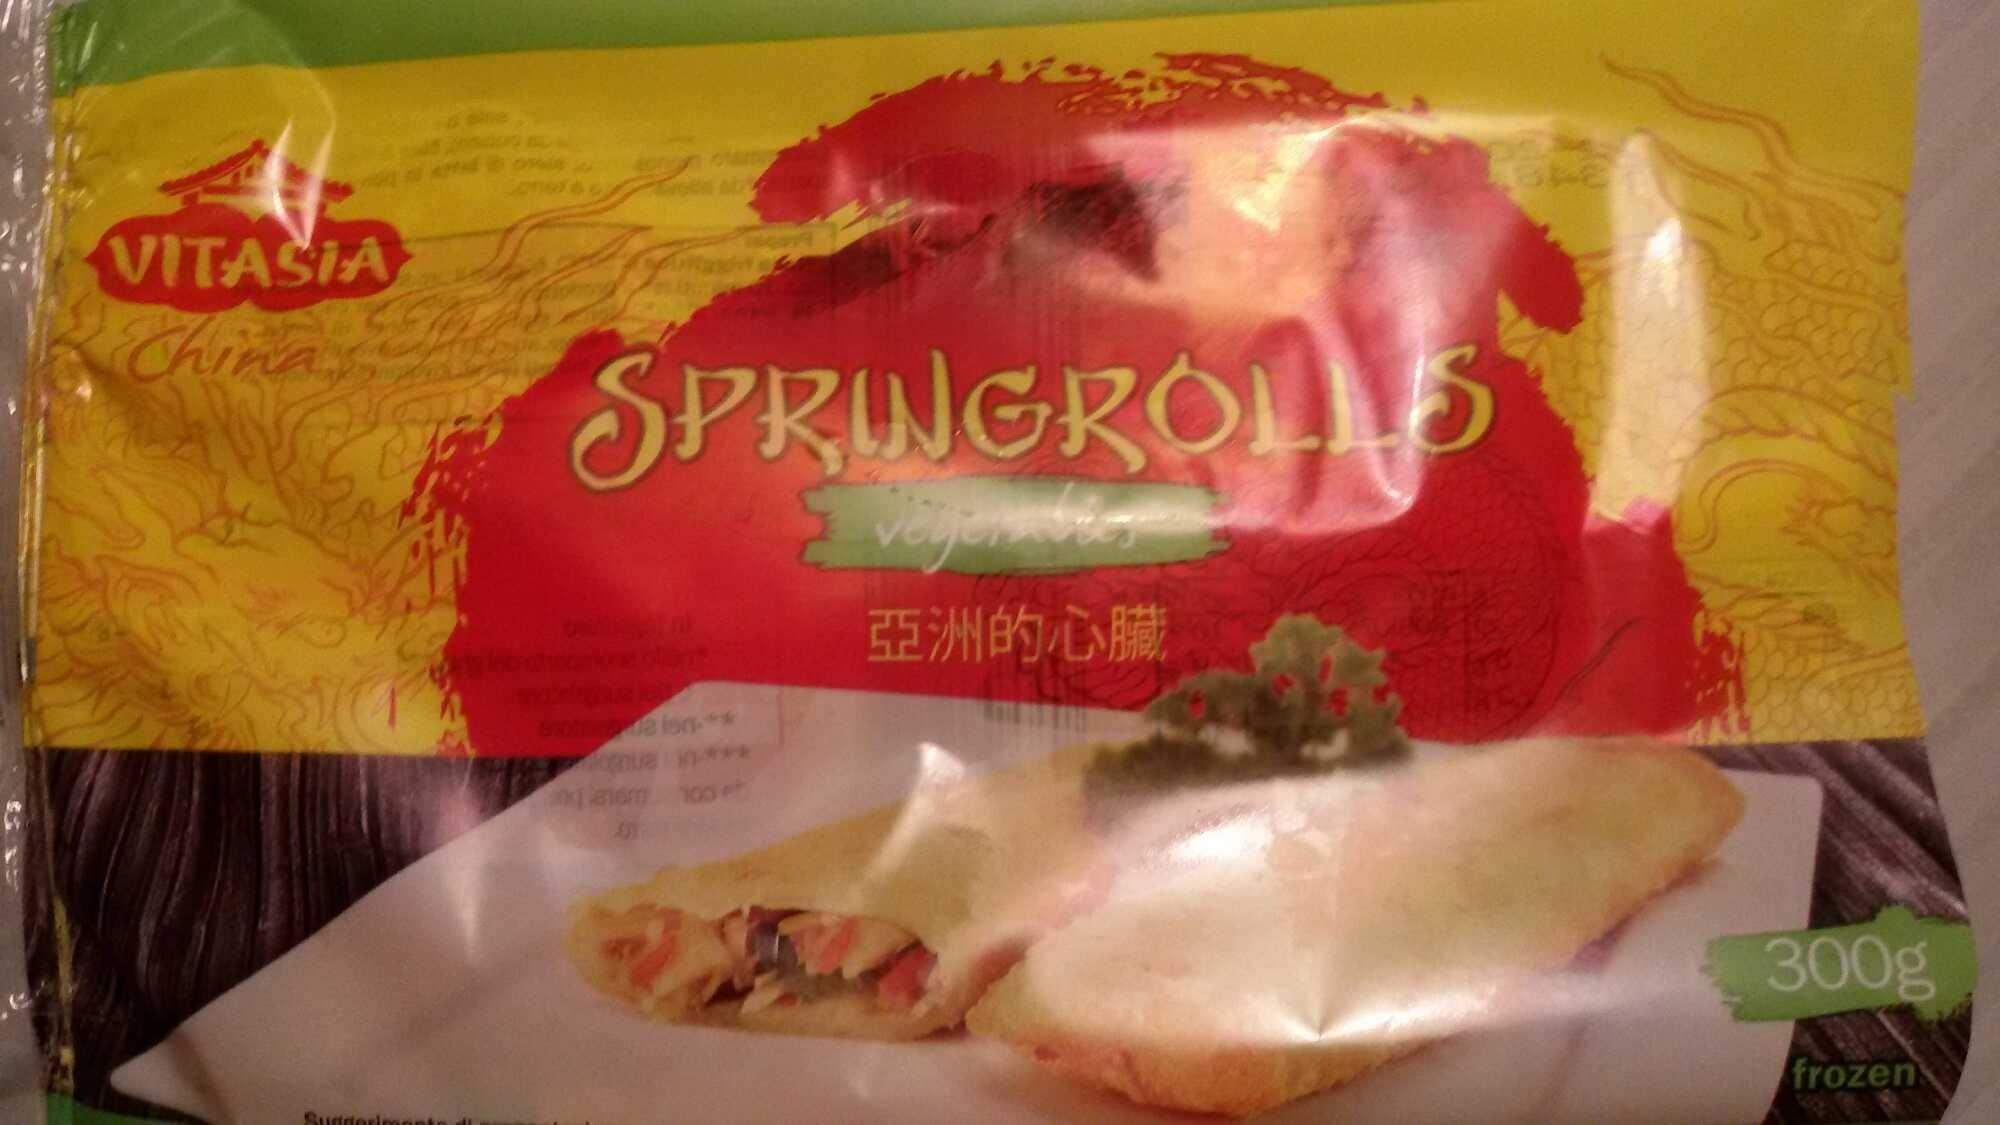 Springrolls - Vitasia - 300 g - Prodotto